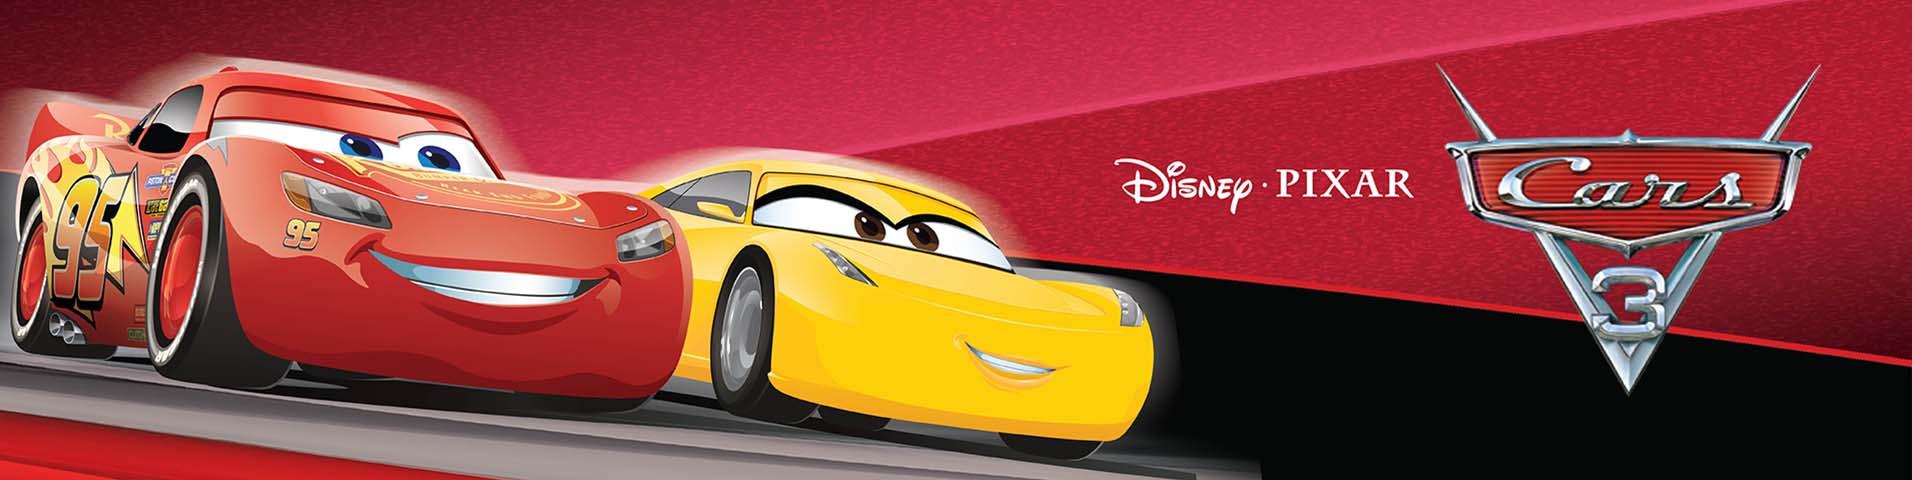 Su Disneypixar Scarpe CarsSaldi Bambini Per Zalando iOkXZPu